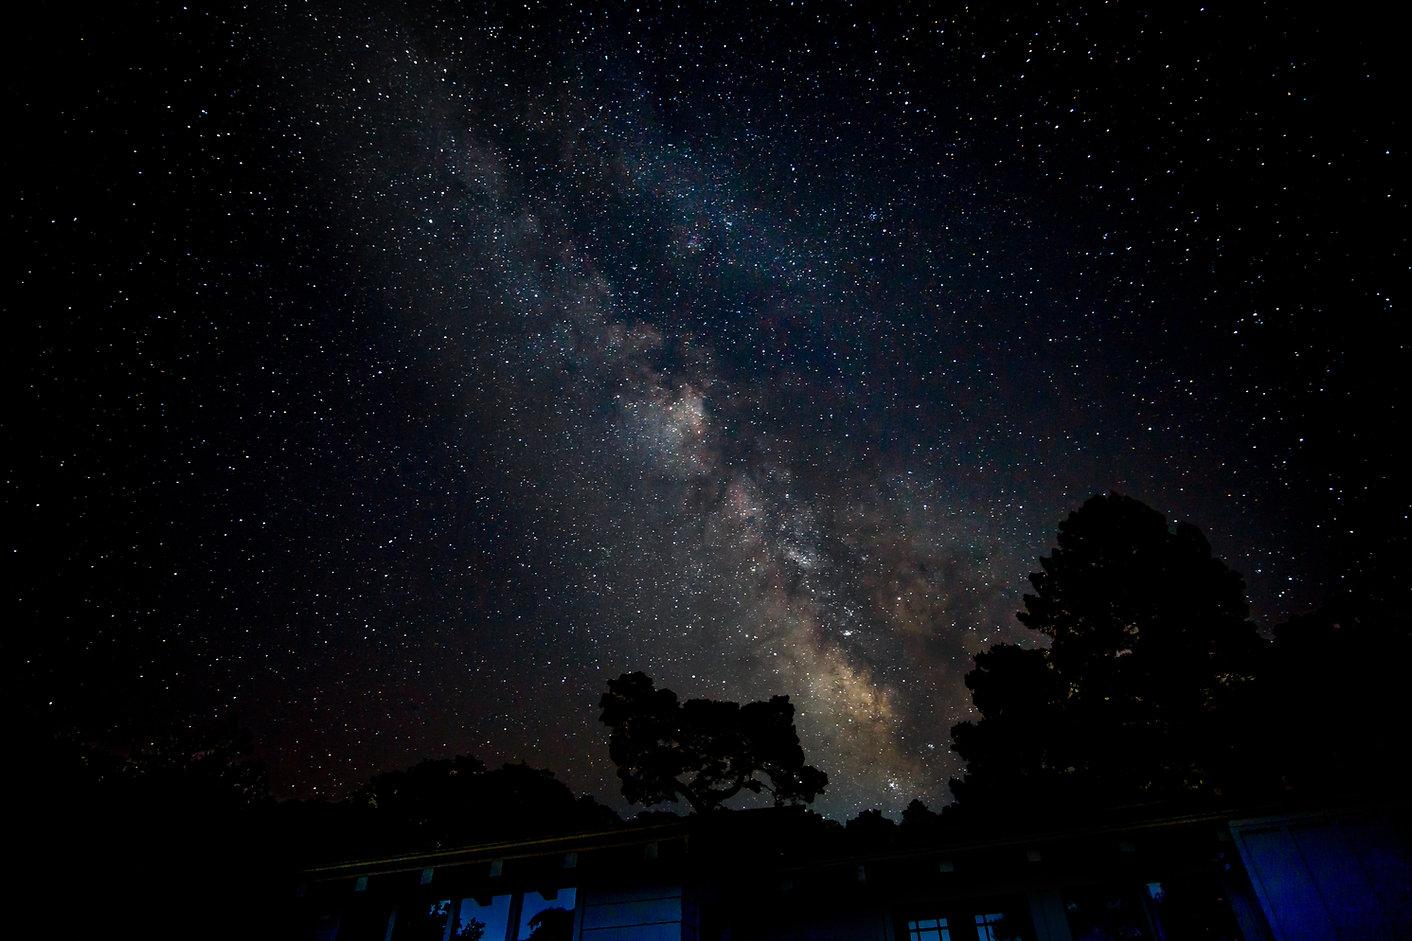 Milky Way galaxy in the summer sky